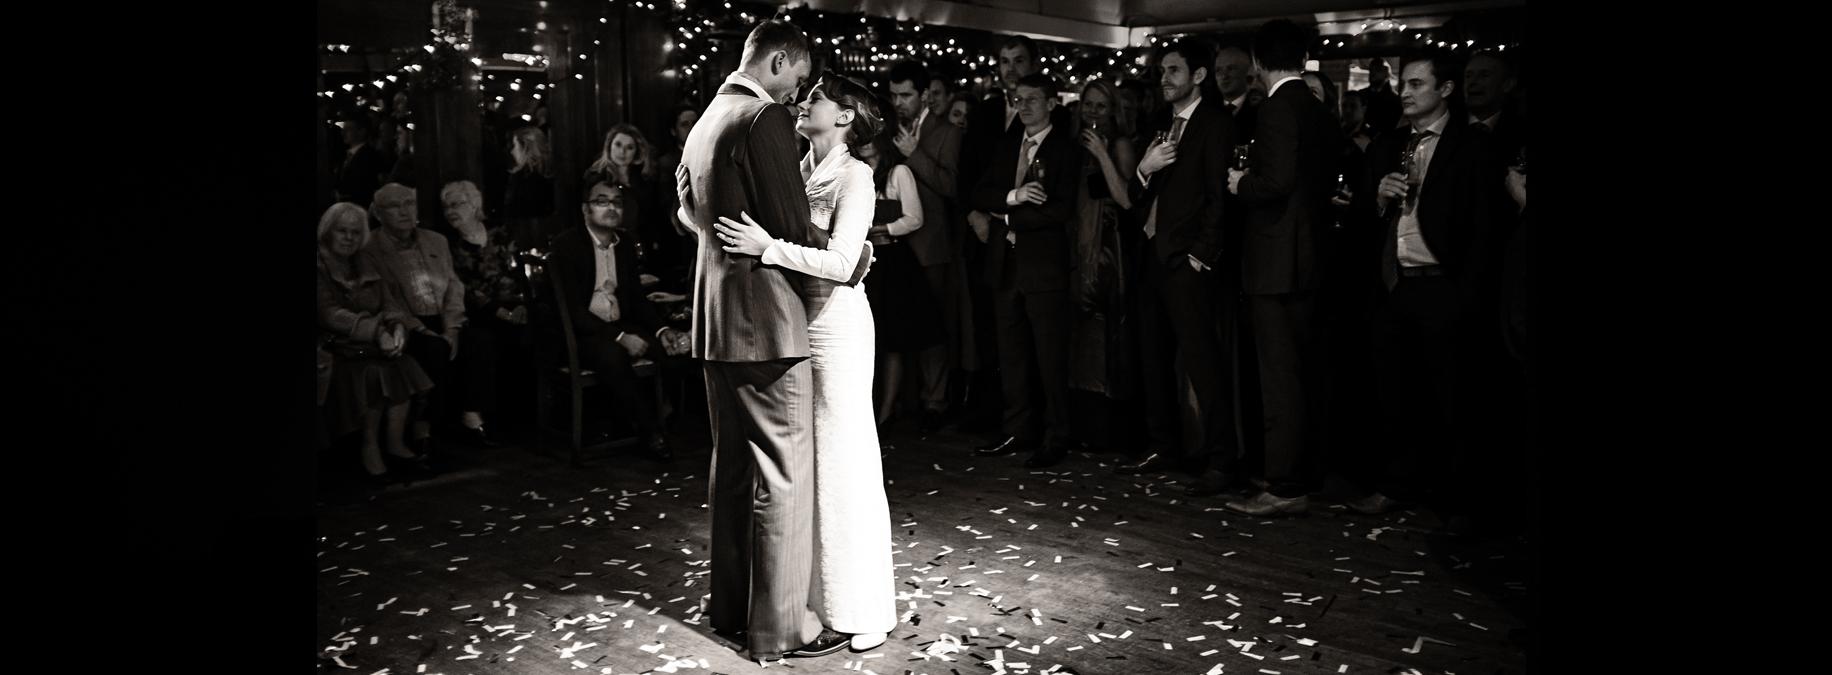 Wedding-Photojournalist-Workshops-Web-SIde